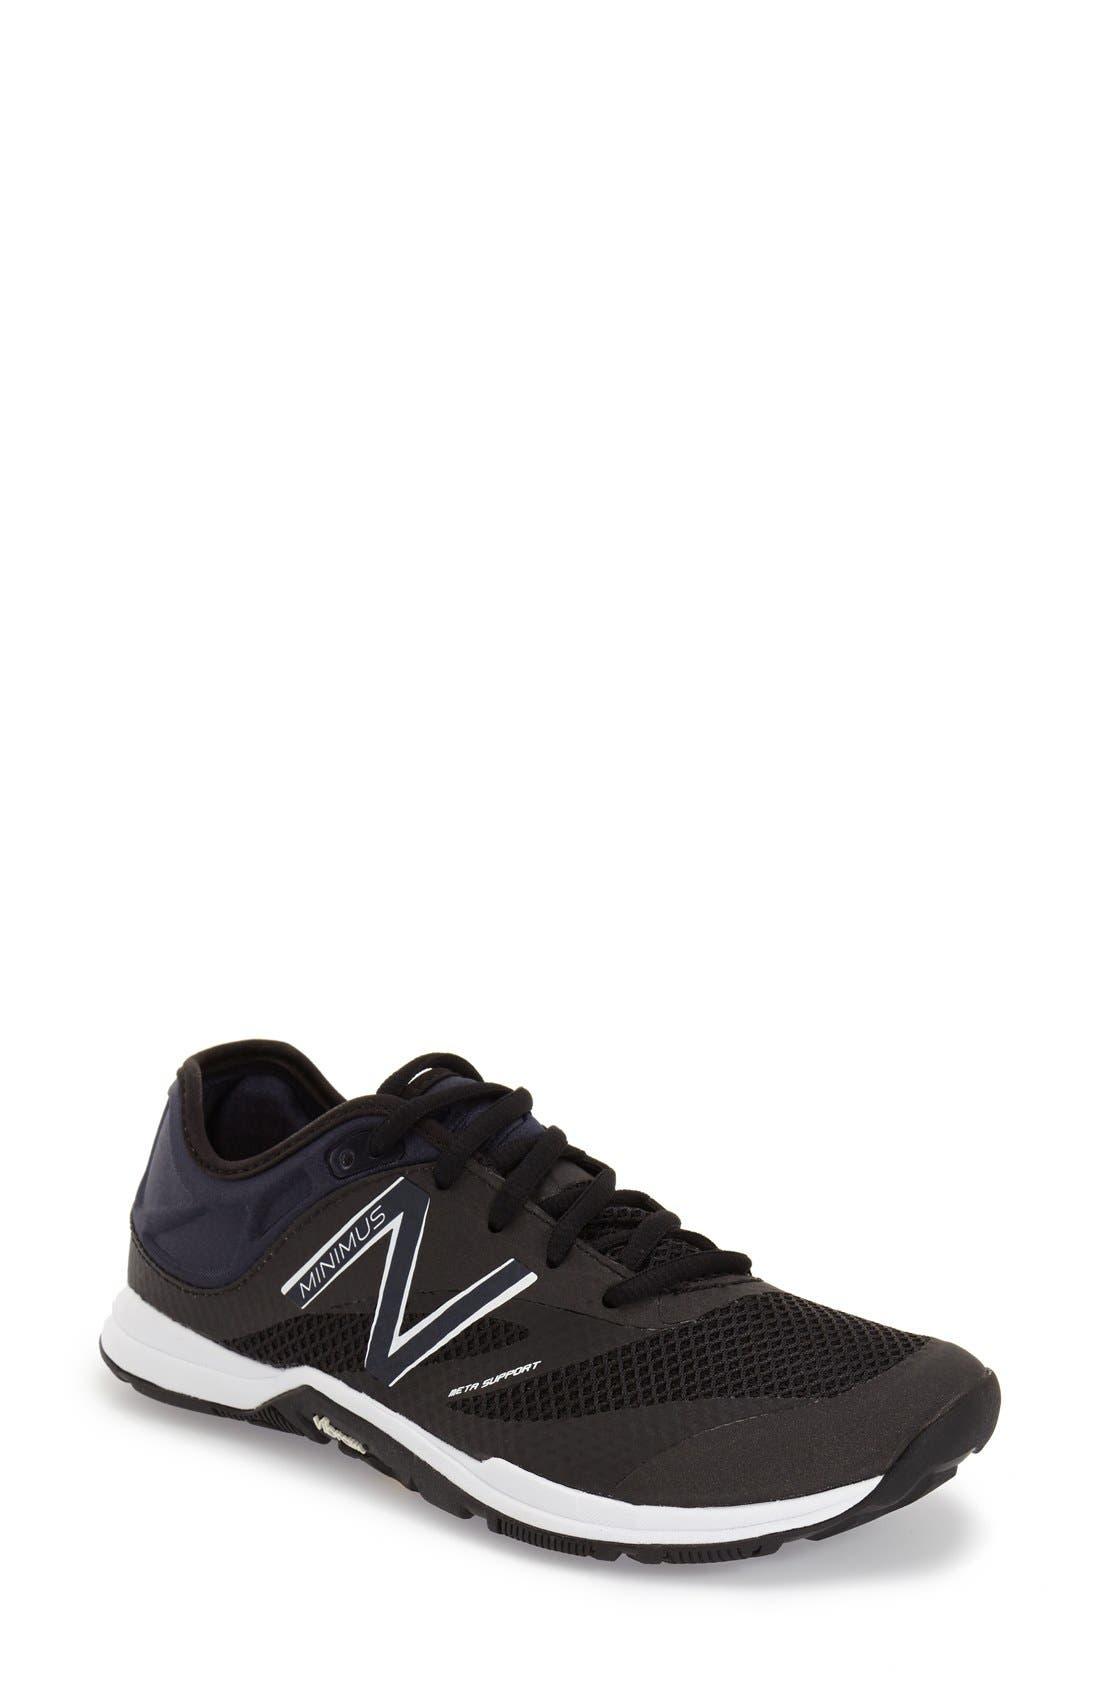 New Balance 'Minimus 20v5' Walking Shoe